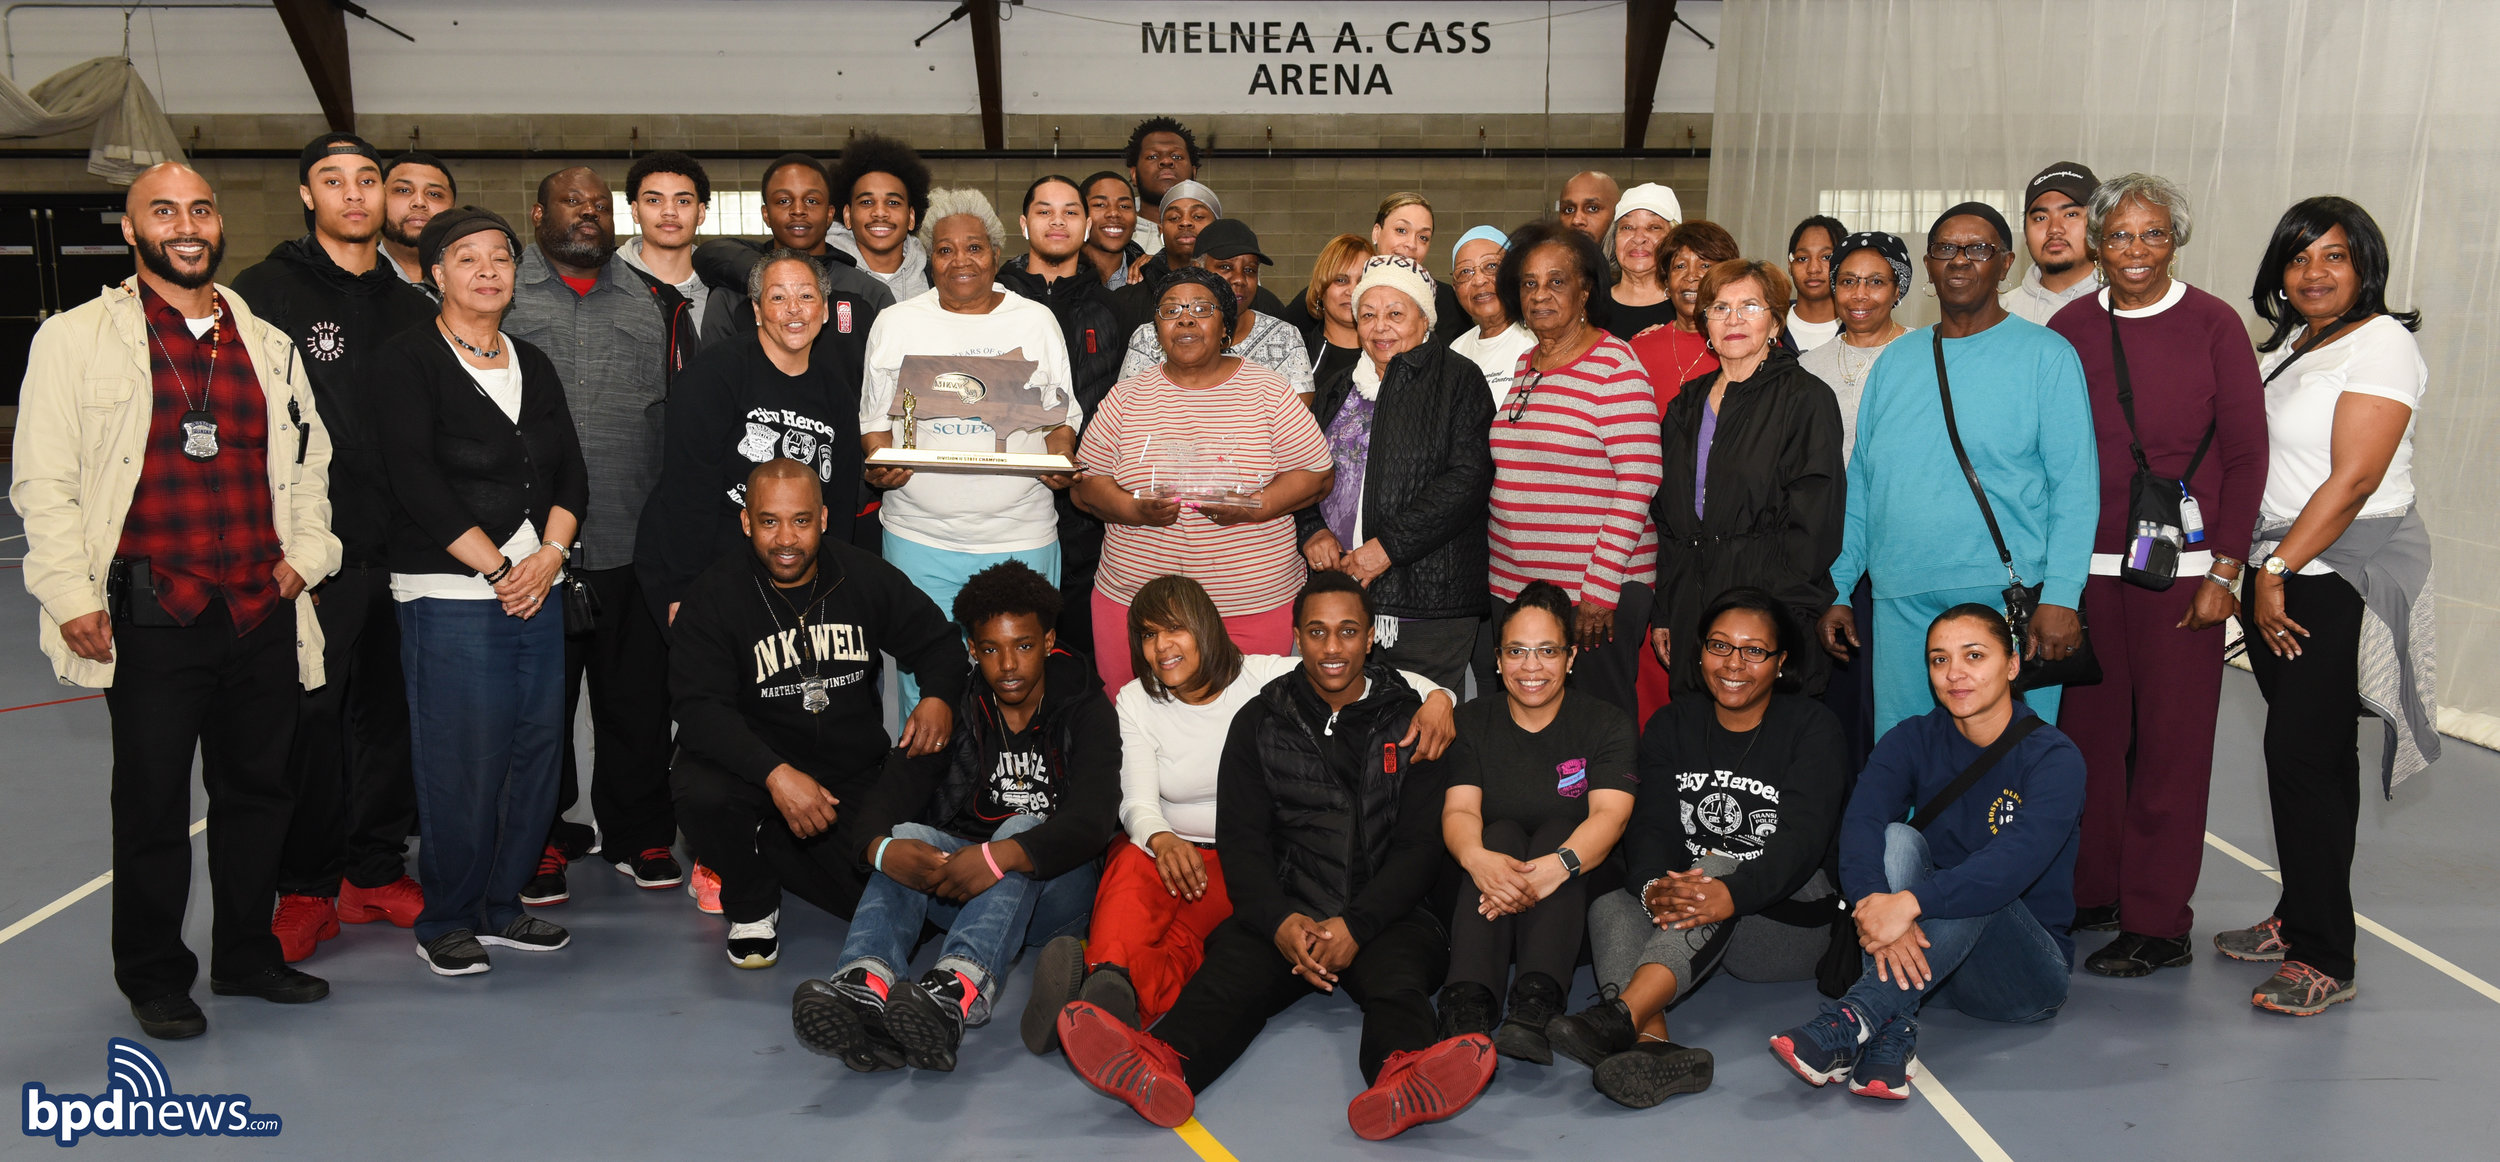 20190425 Seniors walk Melnea Cass Arena-14.jpg